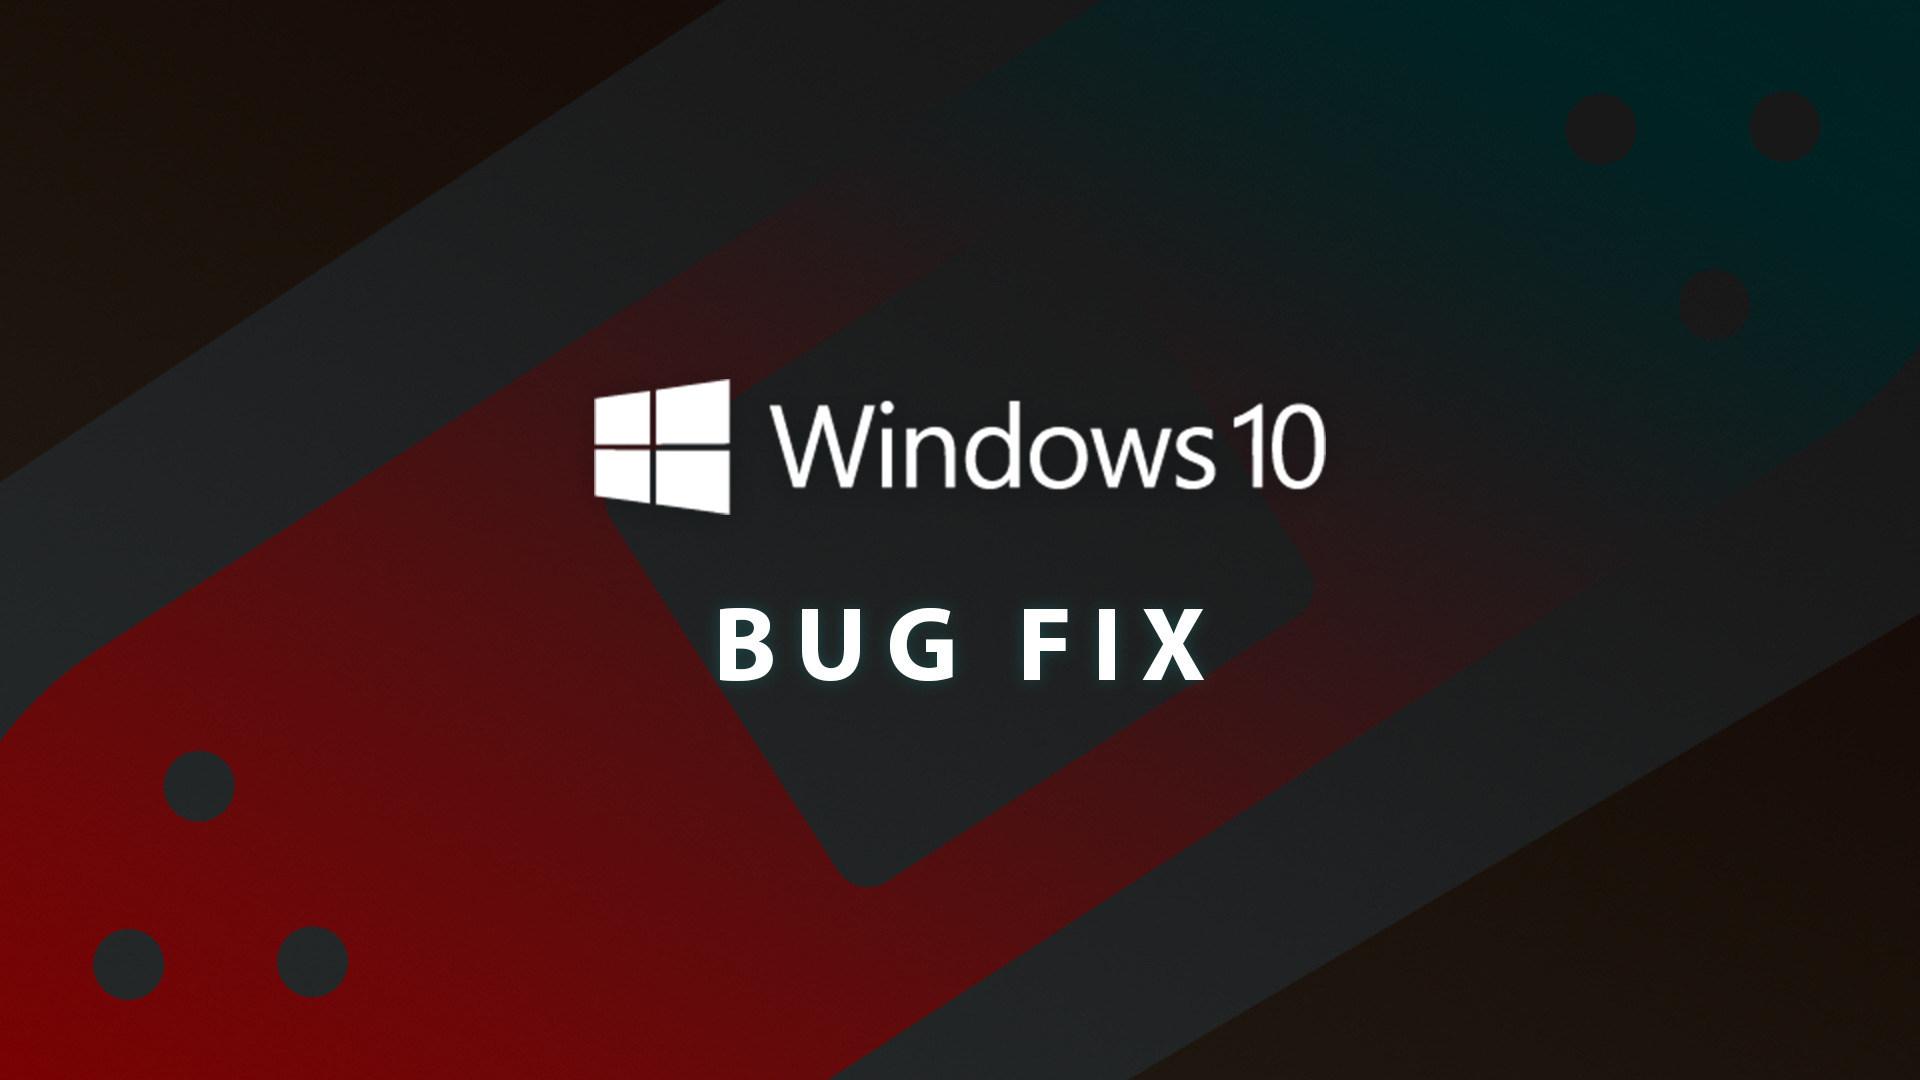 Microsoft, Windows 10, Fehler, Bug, Bugs, Fehlerbehebung, Bugfix, Windows 10 bugs, Windows 10 Bug, Windows 10 Fehler, Bugs bugs bugs, Bugfixes, Windows 10 Bugfix